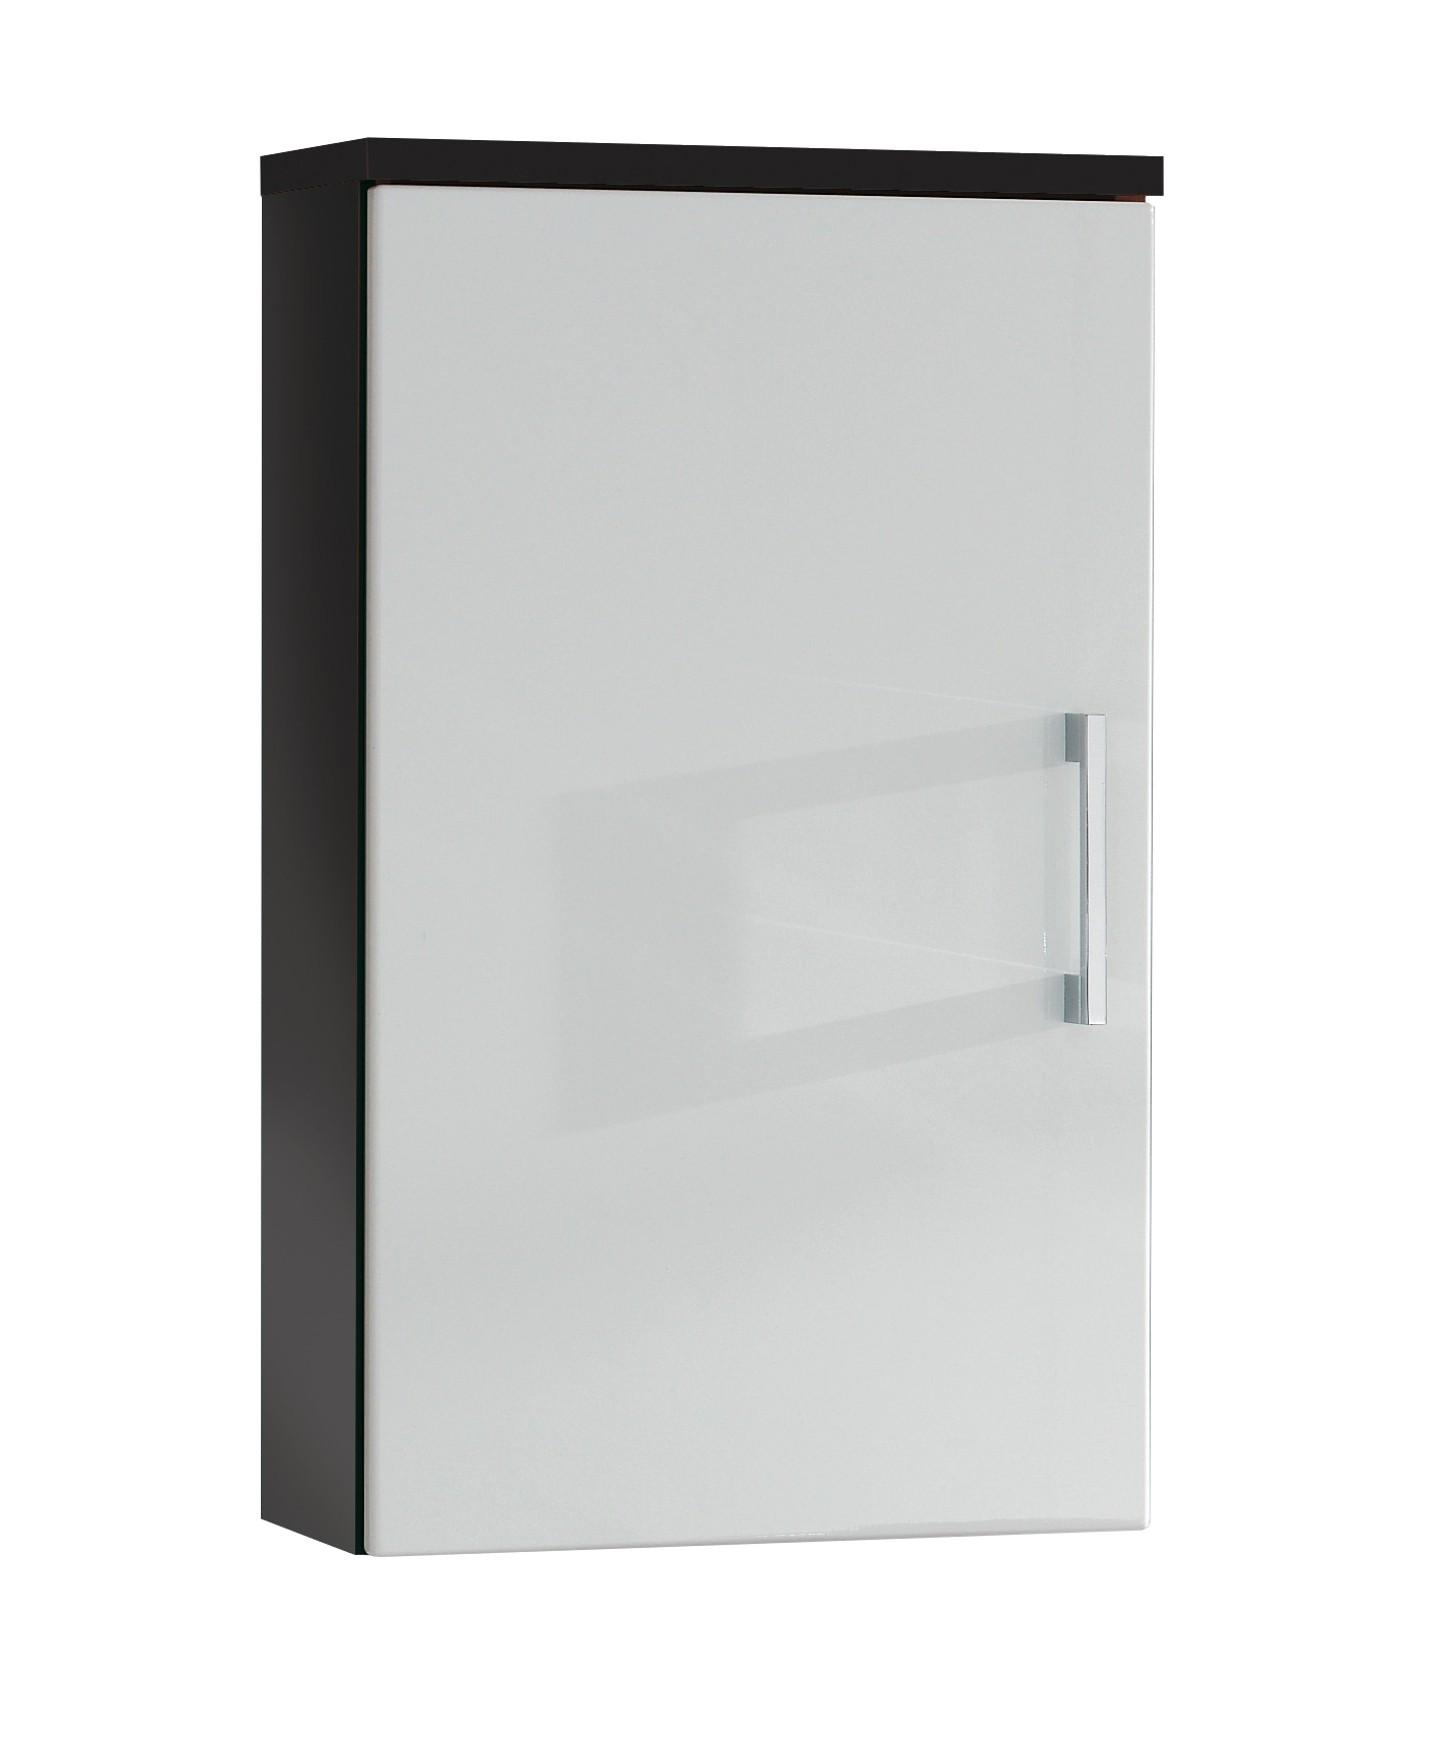 bad h ngeschrank rima 1 t rig 40 cm breit wei grau bad rima. Black Bedroom Furniture Sets. Home Design Ideas